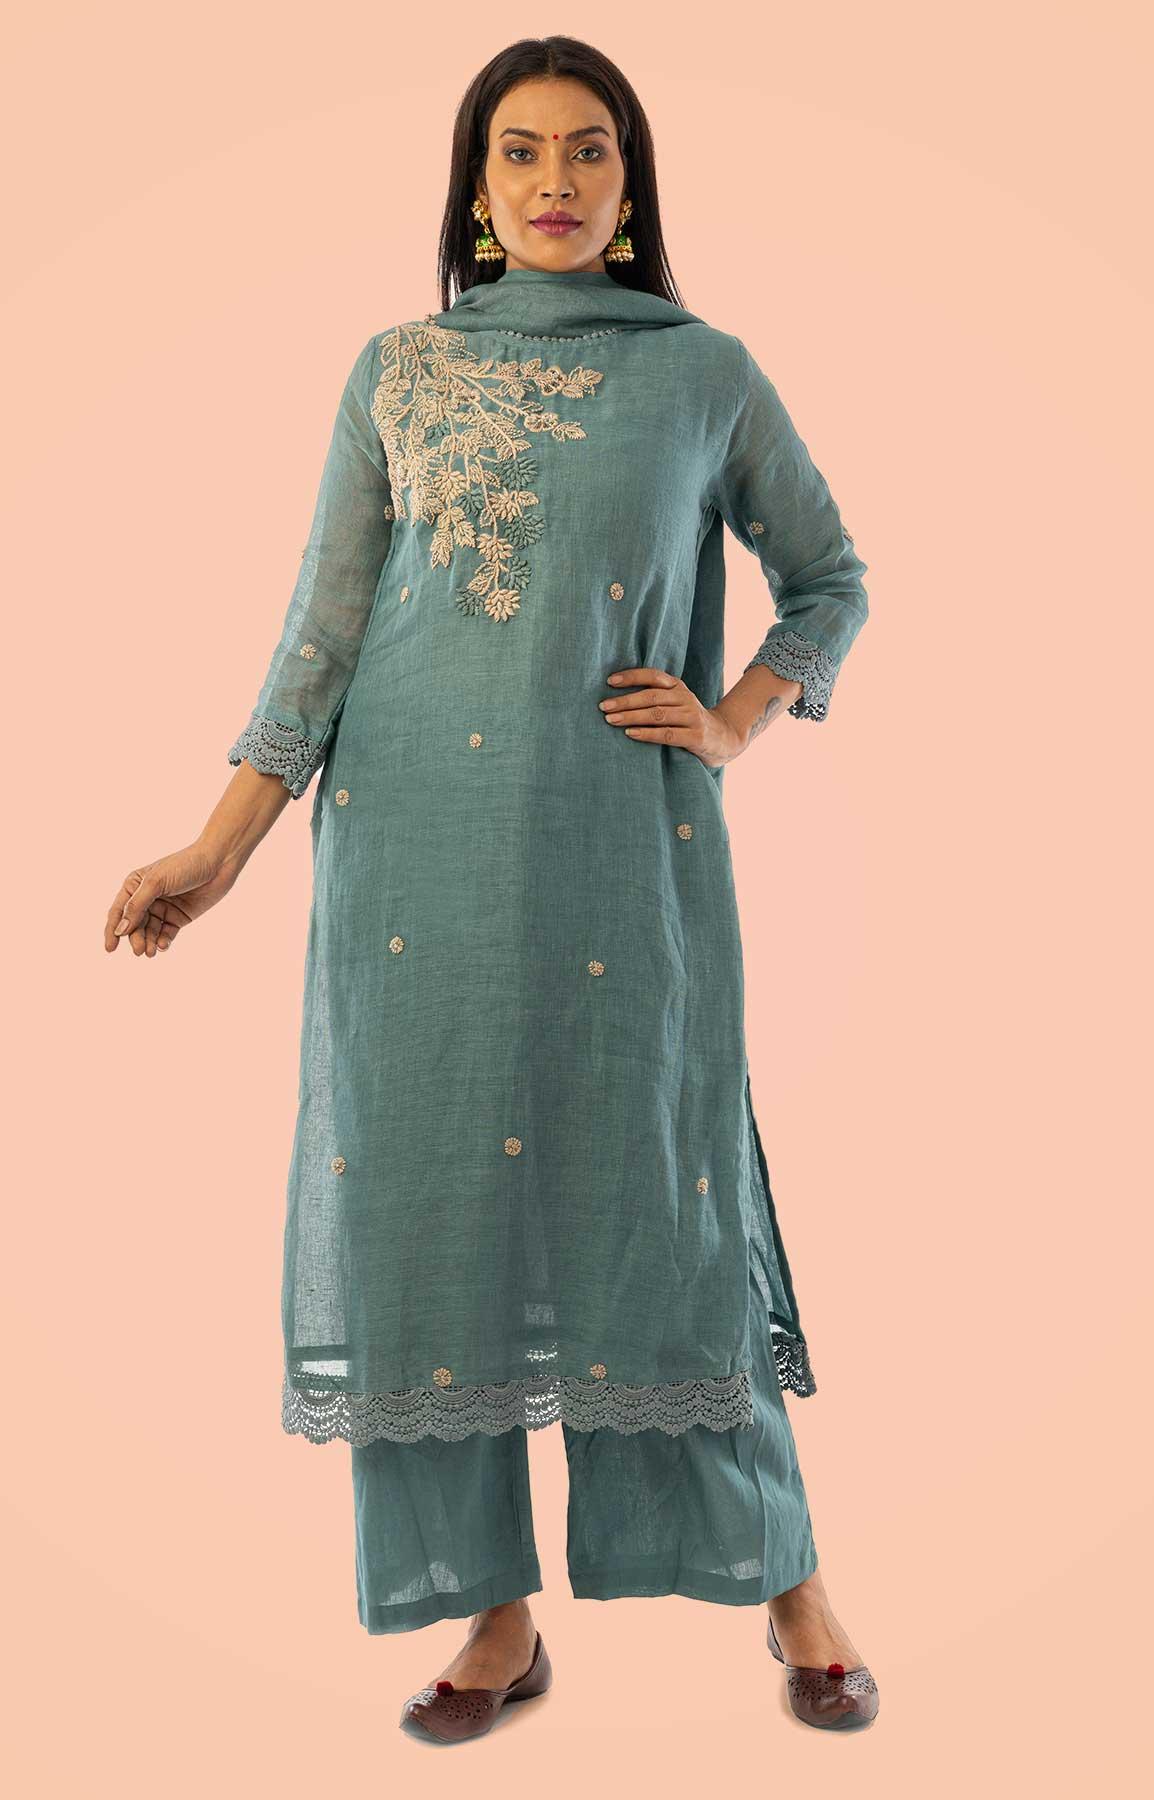 Blueish Grey Linen Suit With Handloom Linen Dupatta – Viraaya By Ushnakmals